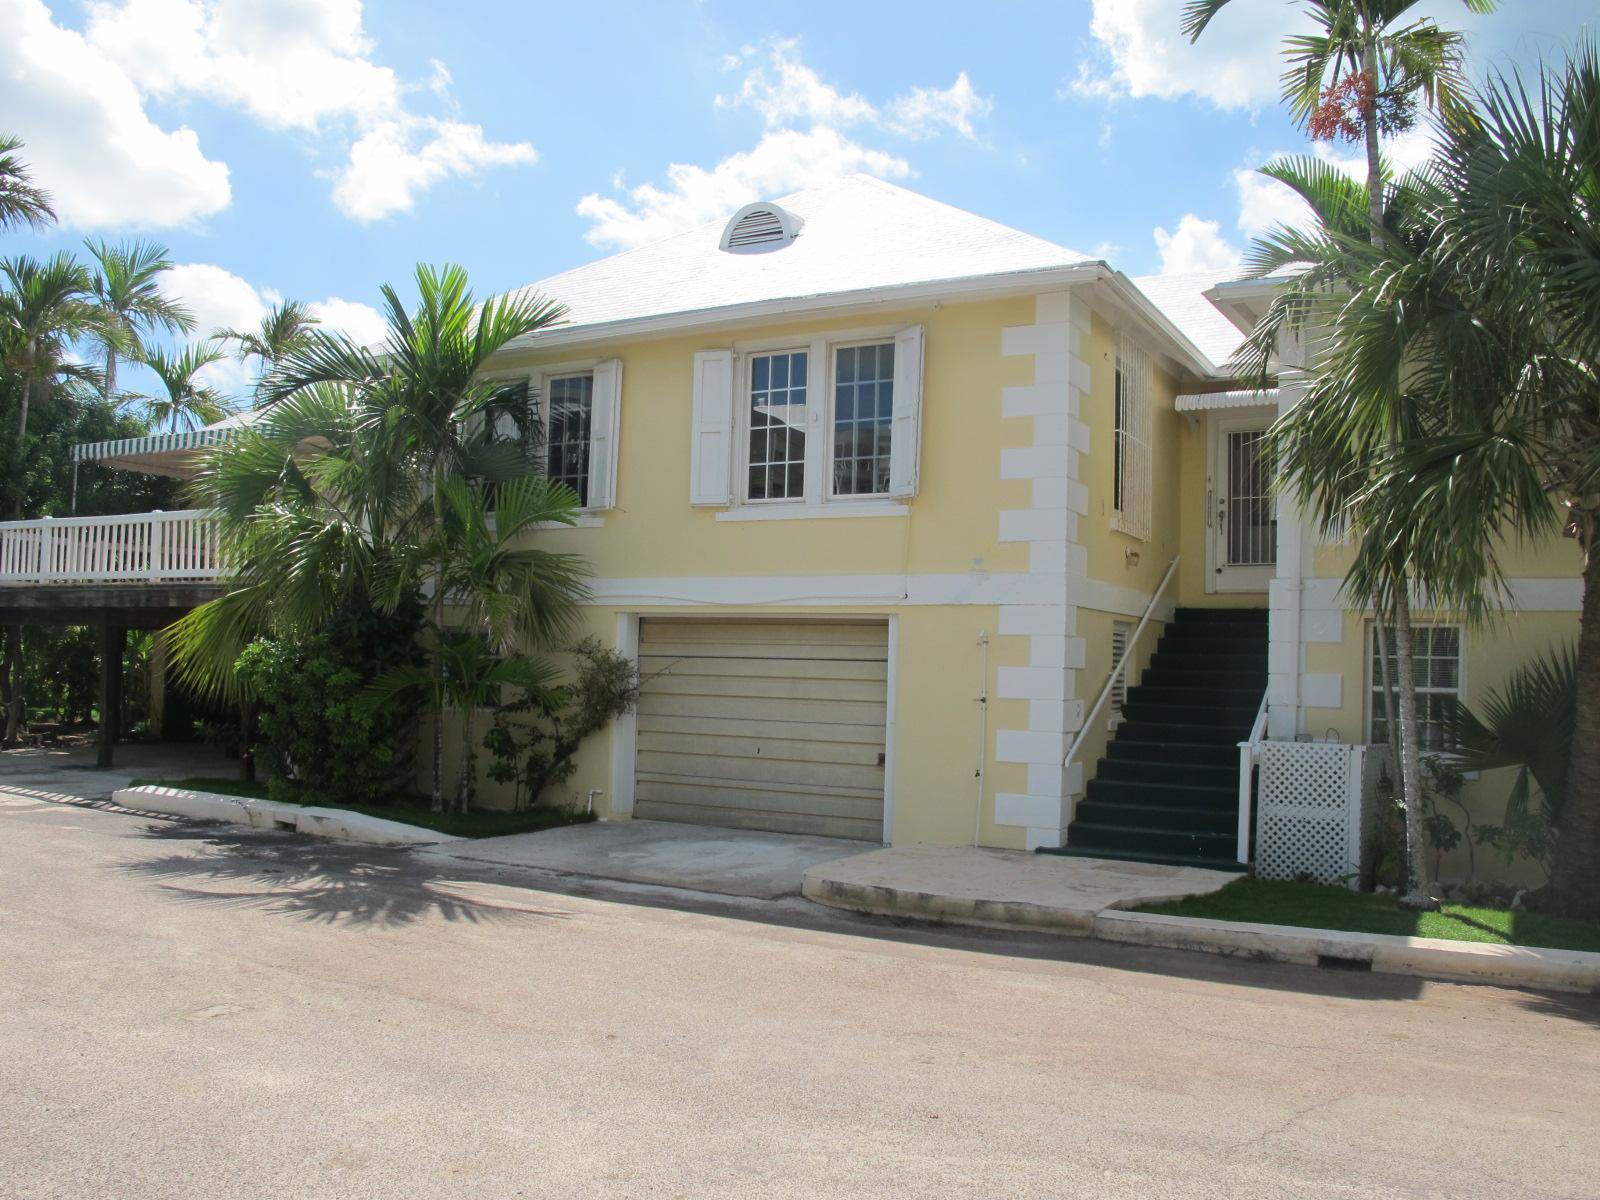 Co-op / Condo for Rent at Spacious Condo in Quiet Cul-de-sac Cable Beach, Nassau And Paradise Island, Bahamas